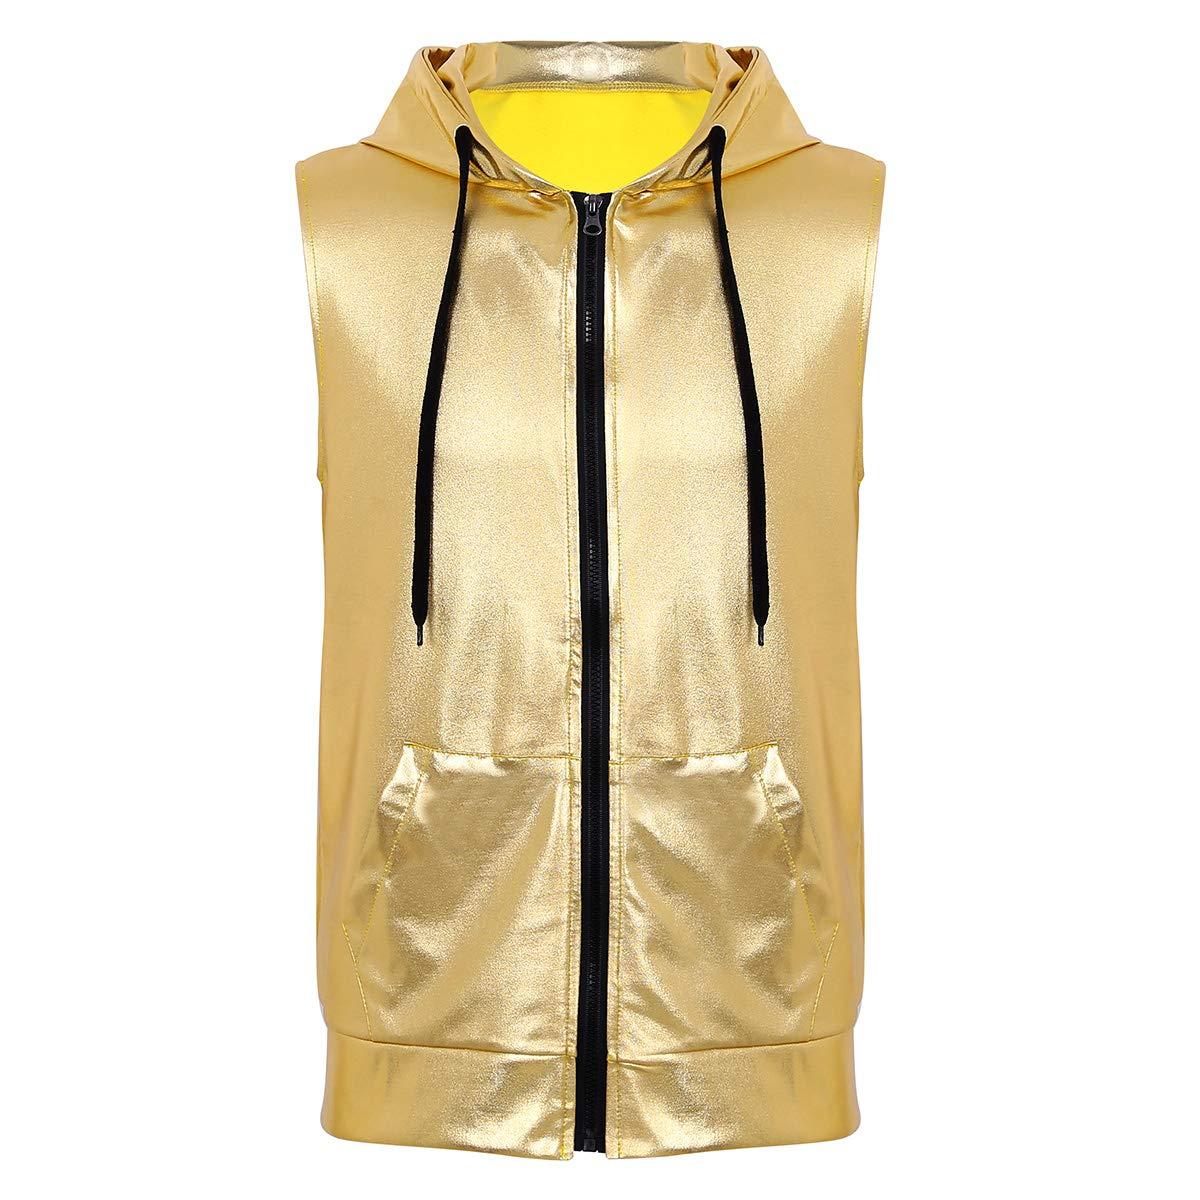 Herren Lack-Optik Tanktop Ärmelloses Shirt Weste Clubwear Kostüm Prty